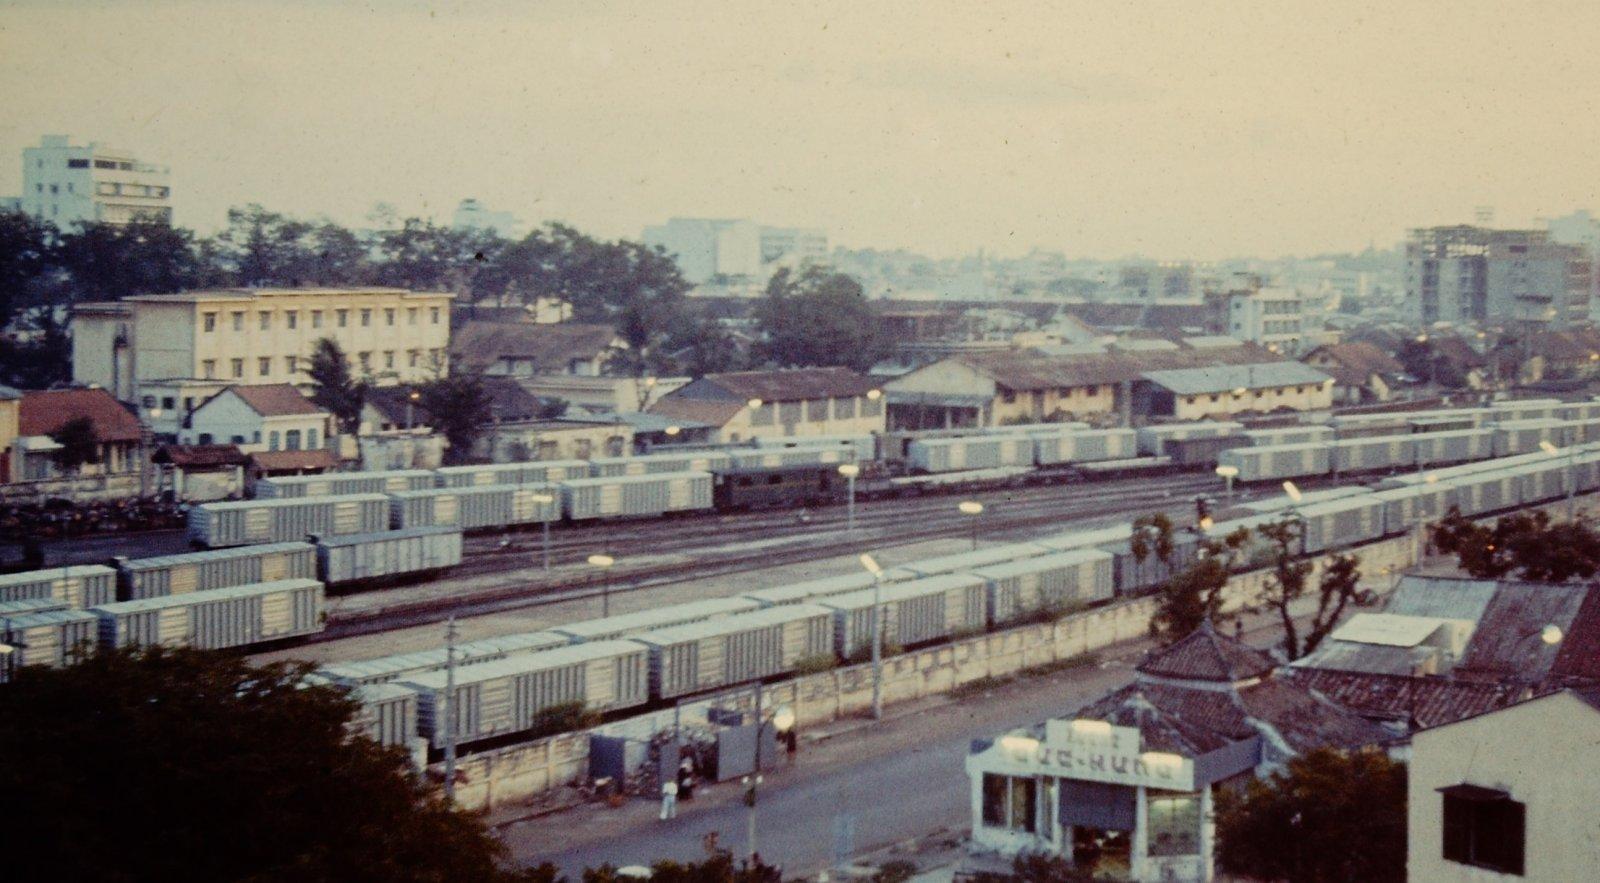 SaigonStation-1965-2.jpg